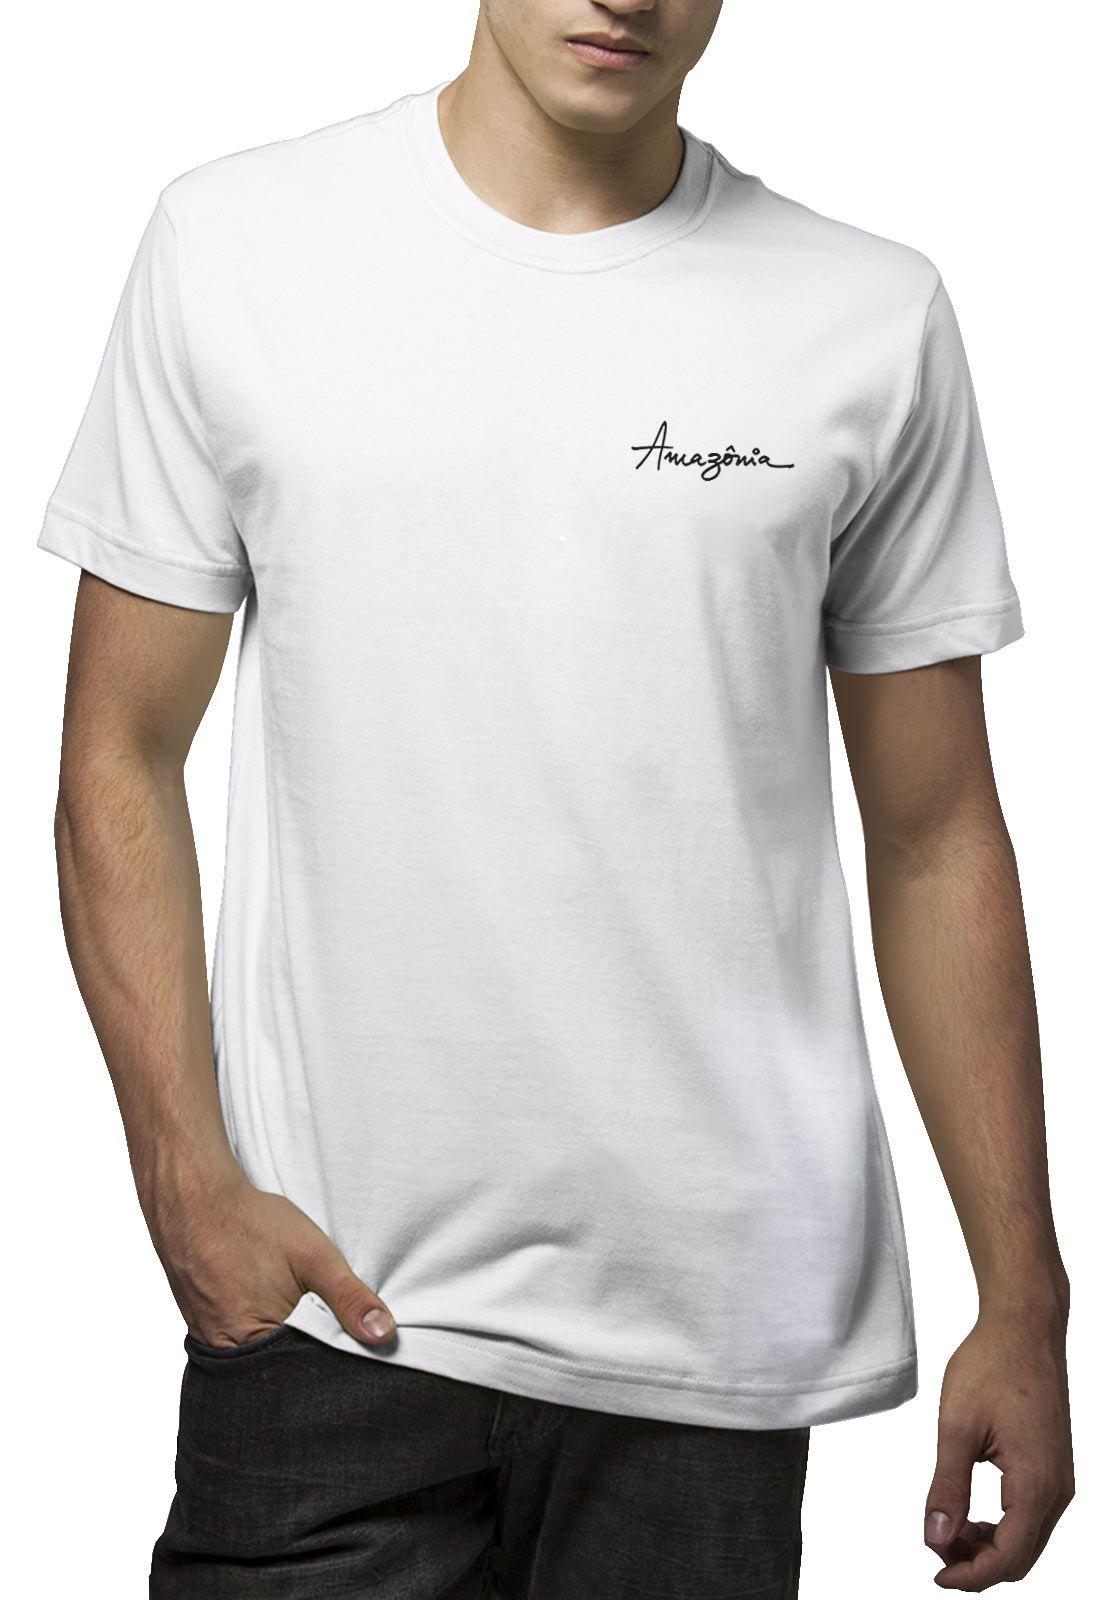 Camiseta Amazônia Mapa Aves - Branco